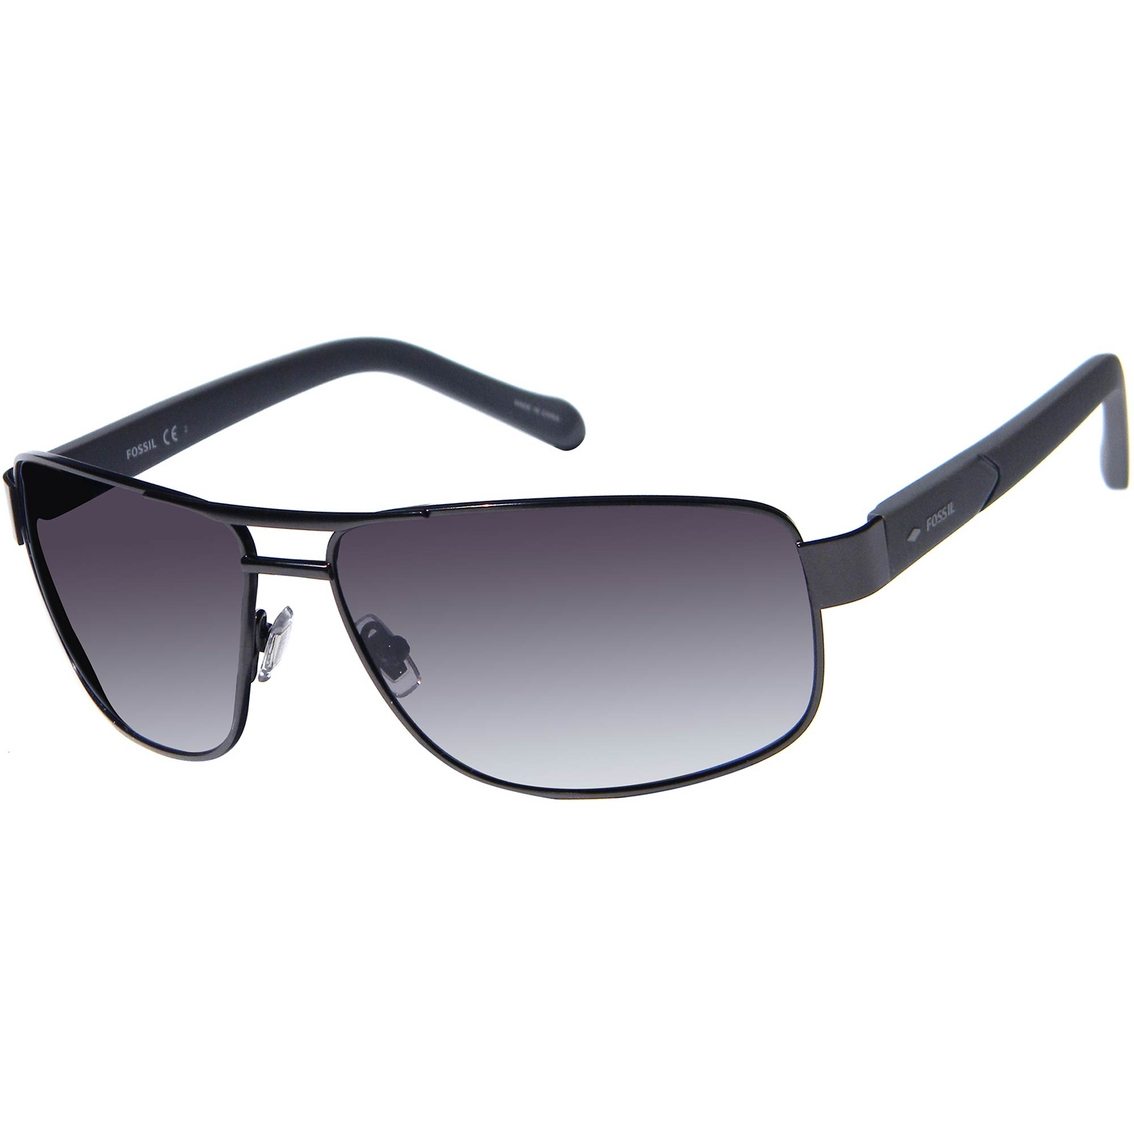 46cca145316 Walmart Fossil Sunglasses Men